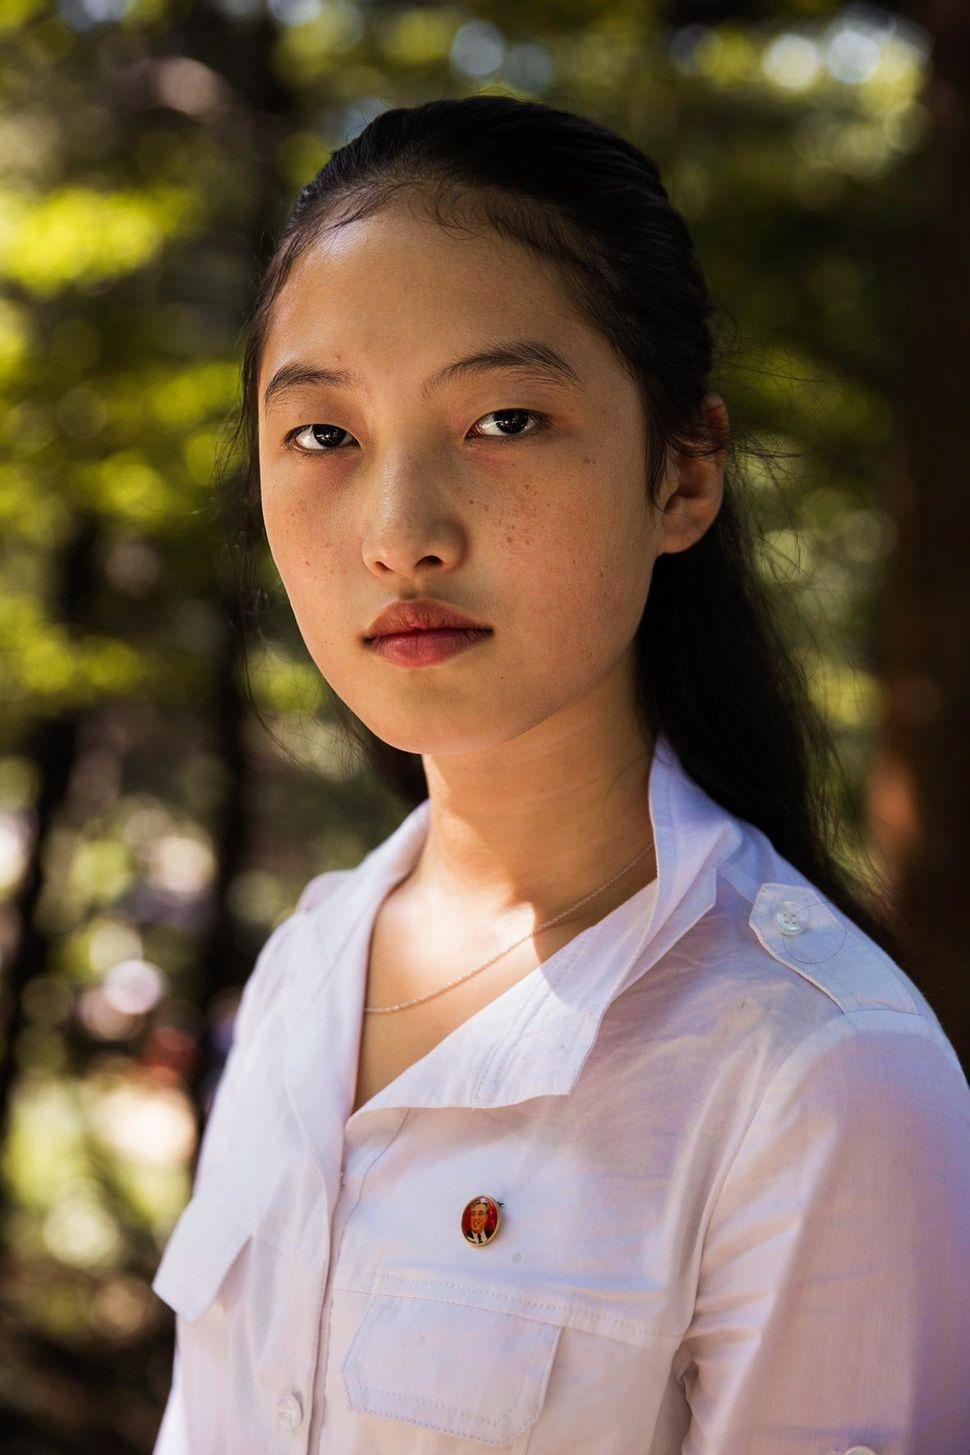 photos of women in north korea show beauty crosses all boundaries